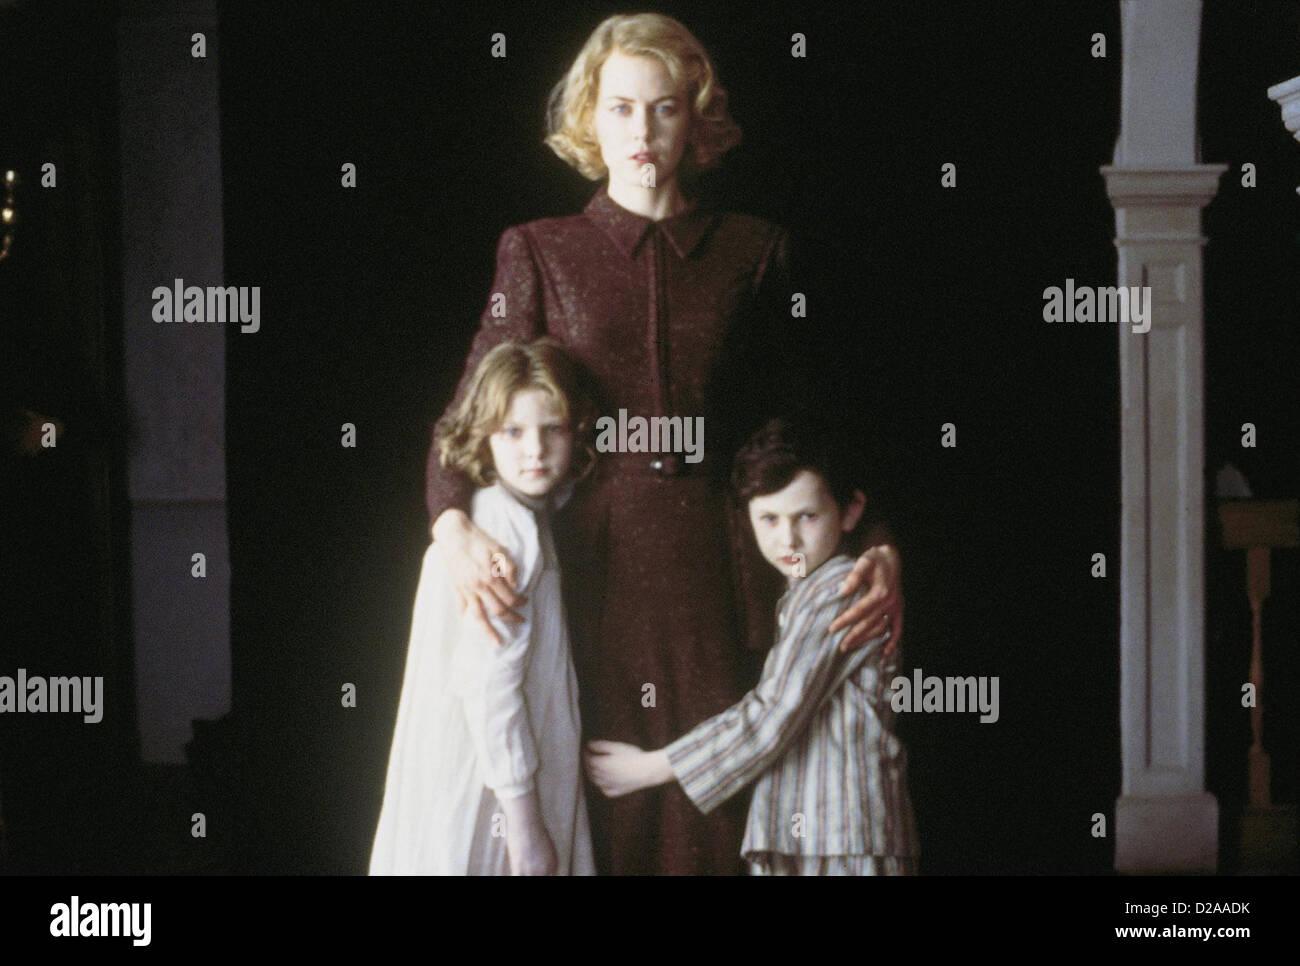 The Other Otros Los Alakina Mann Nicole Kidman James Bentley